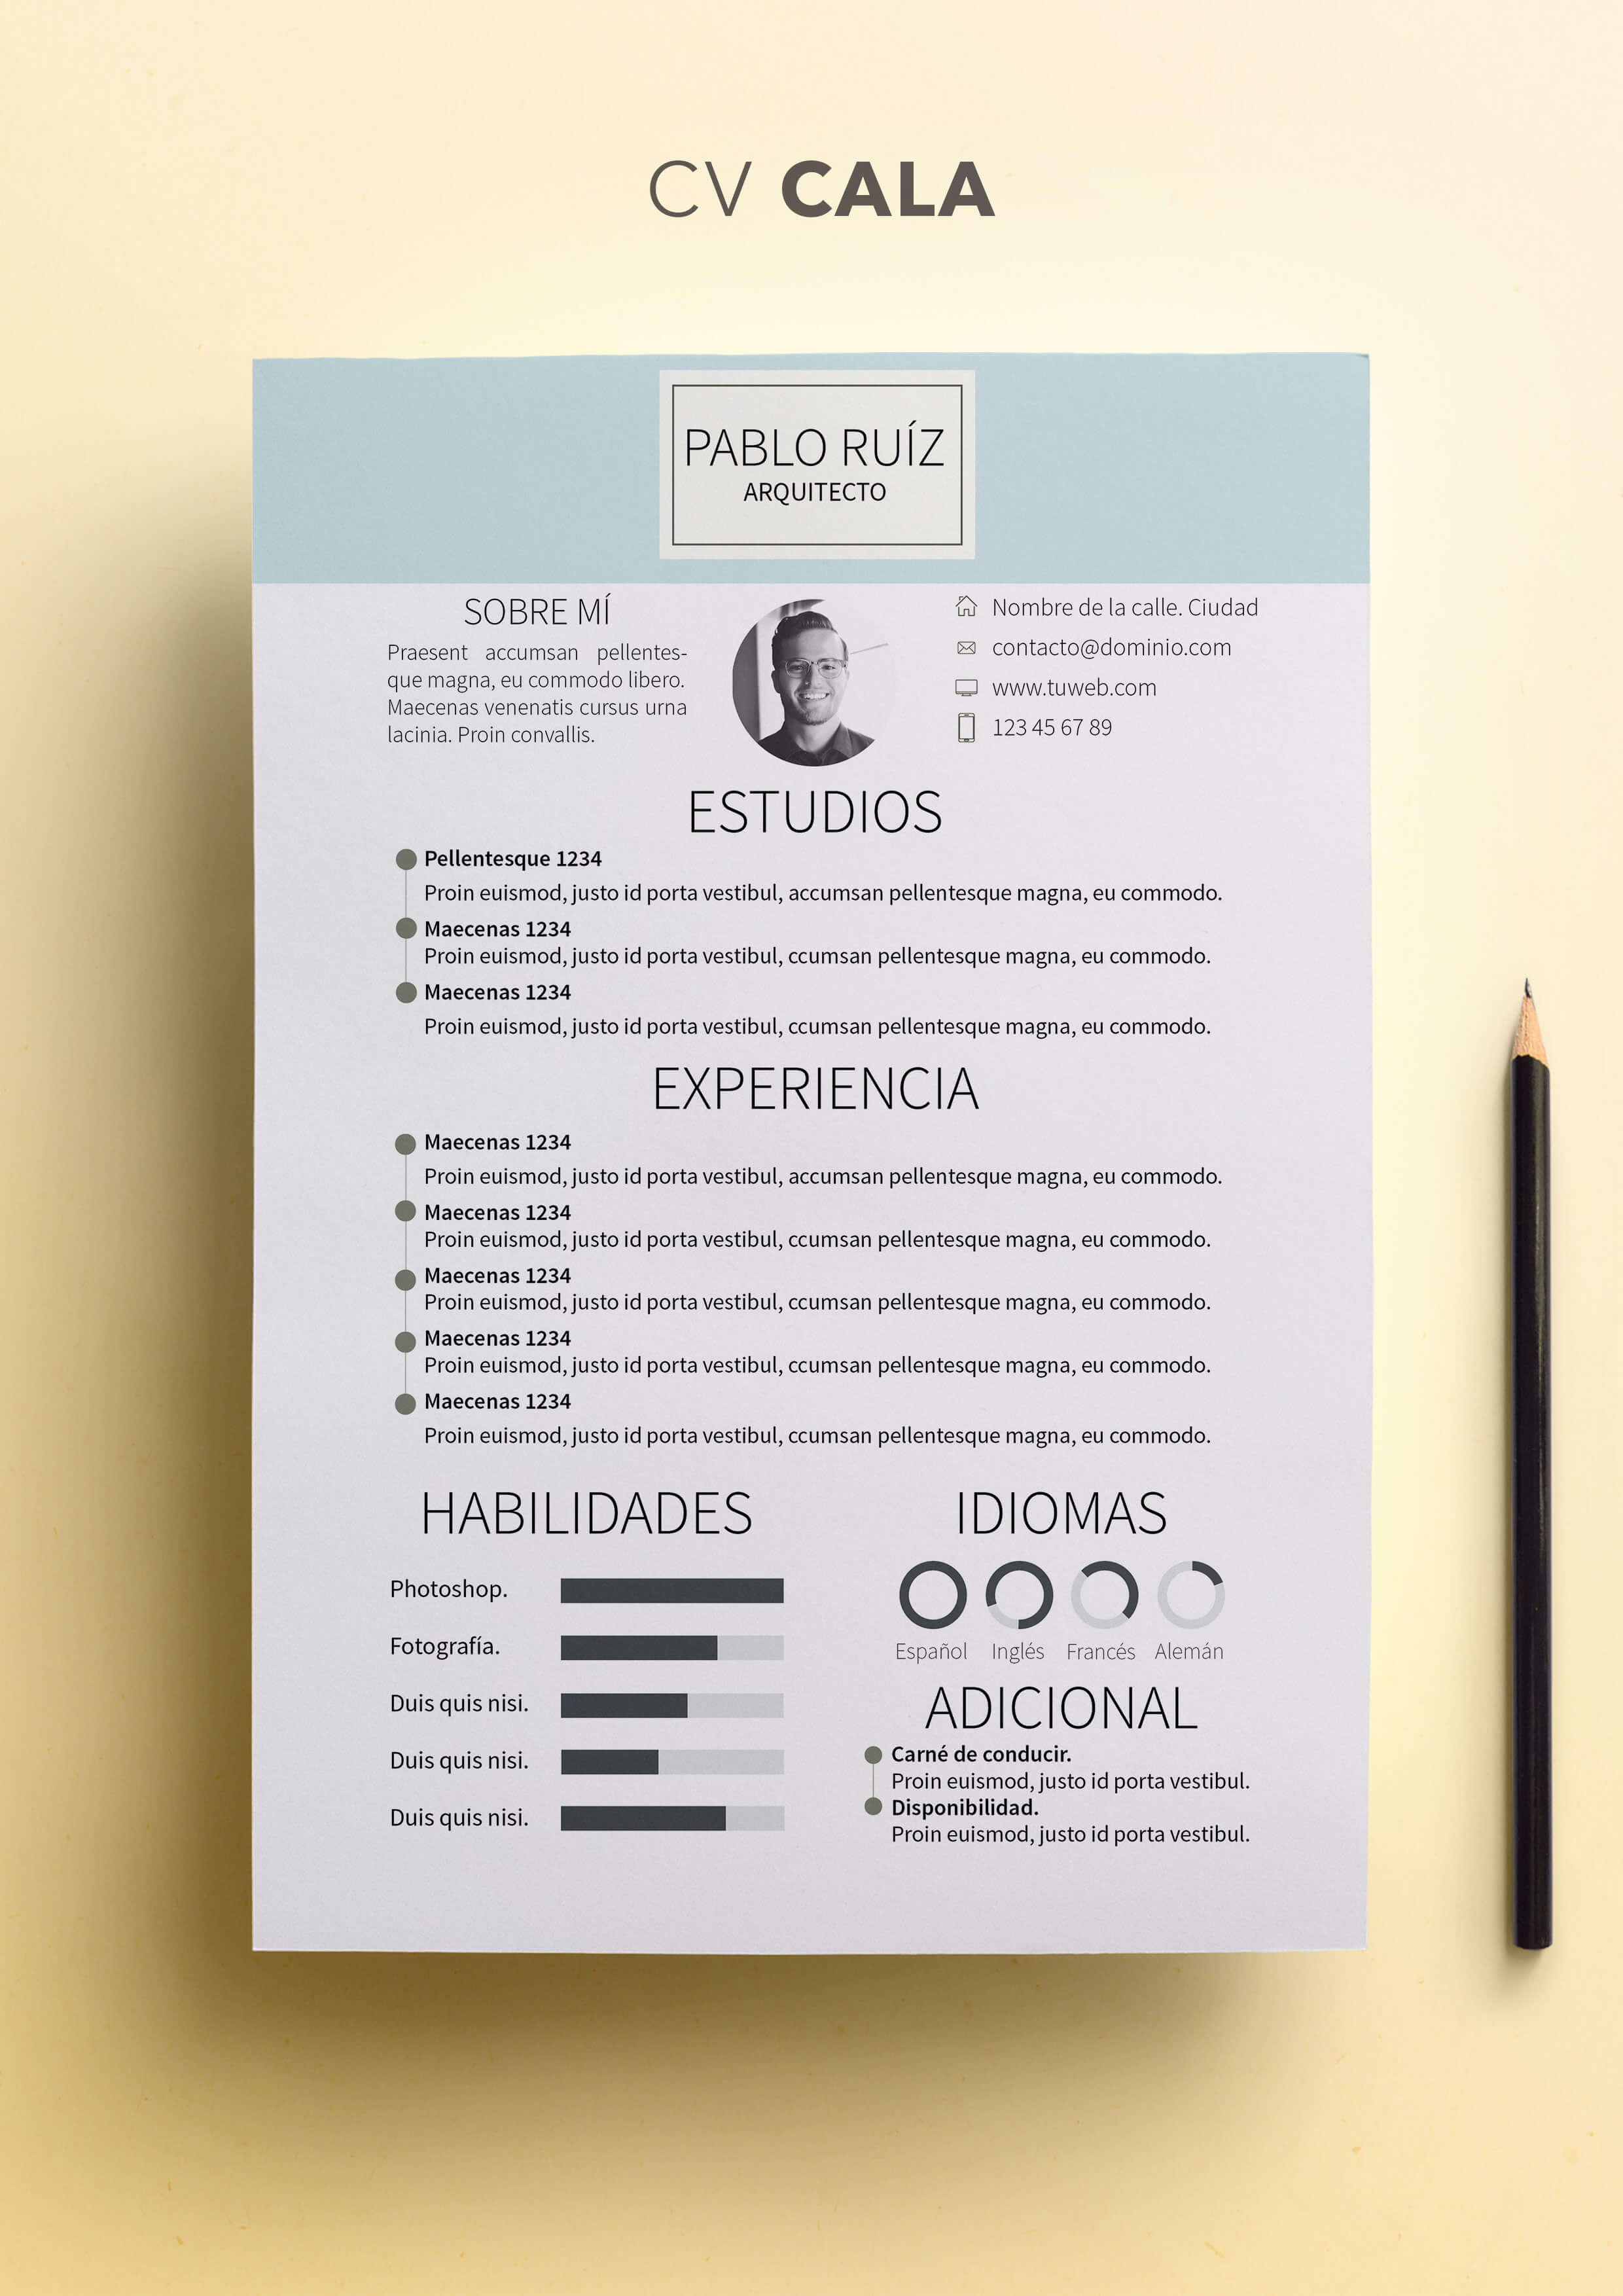 Curriculum Vitae modelo Cala | Shop CV